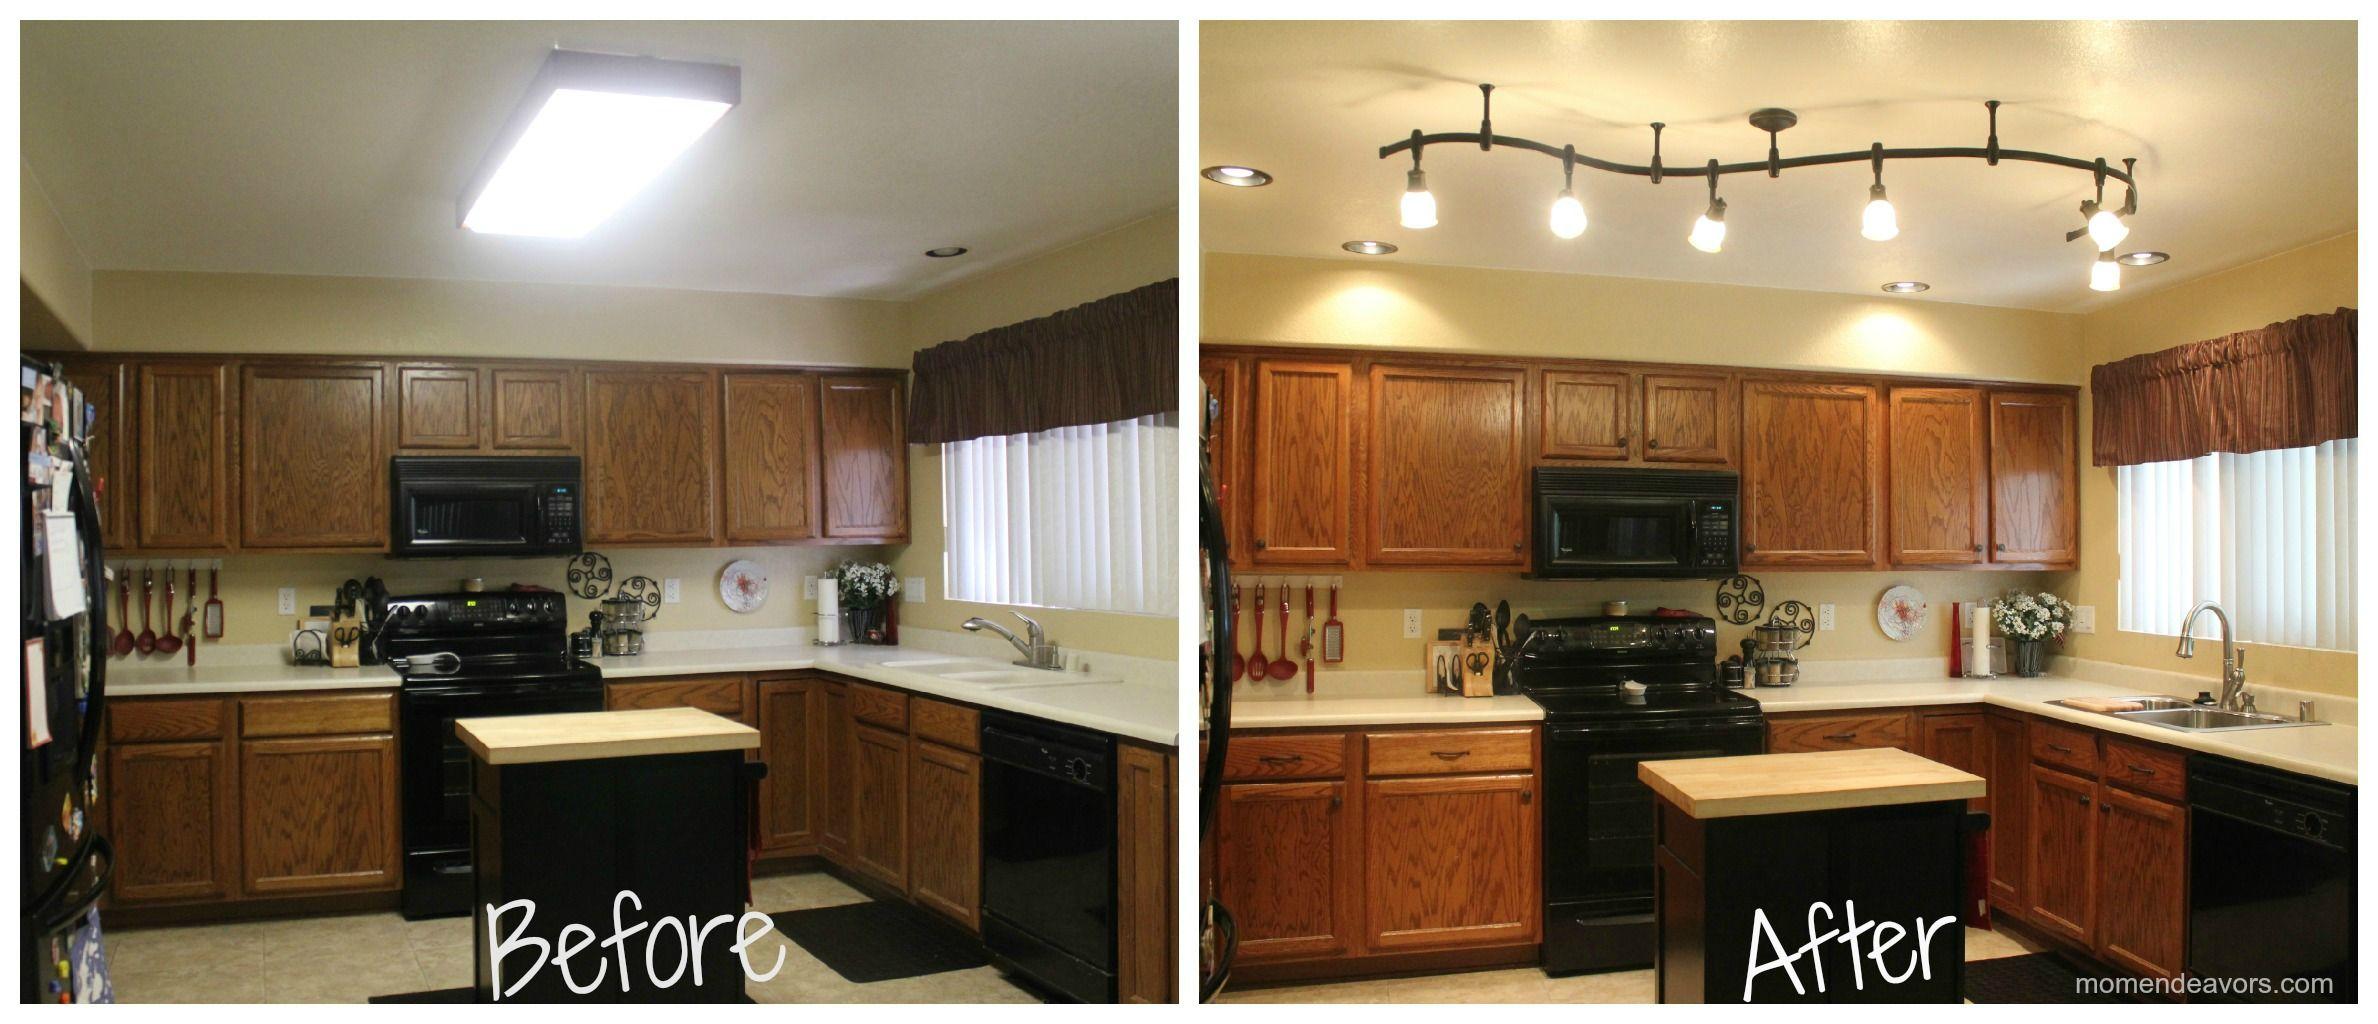 Best Kitchen Lighting Low Ceilings